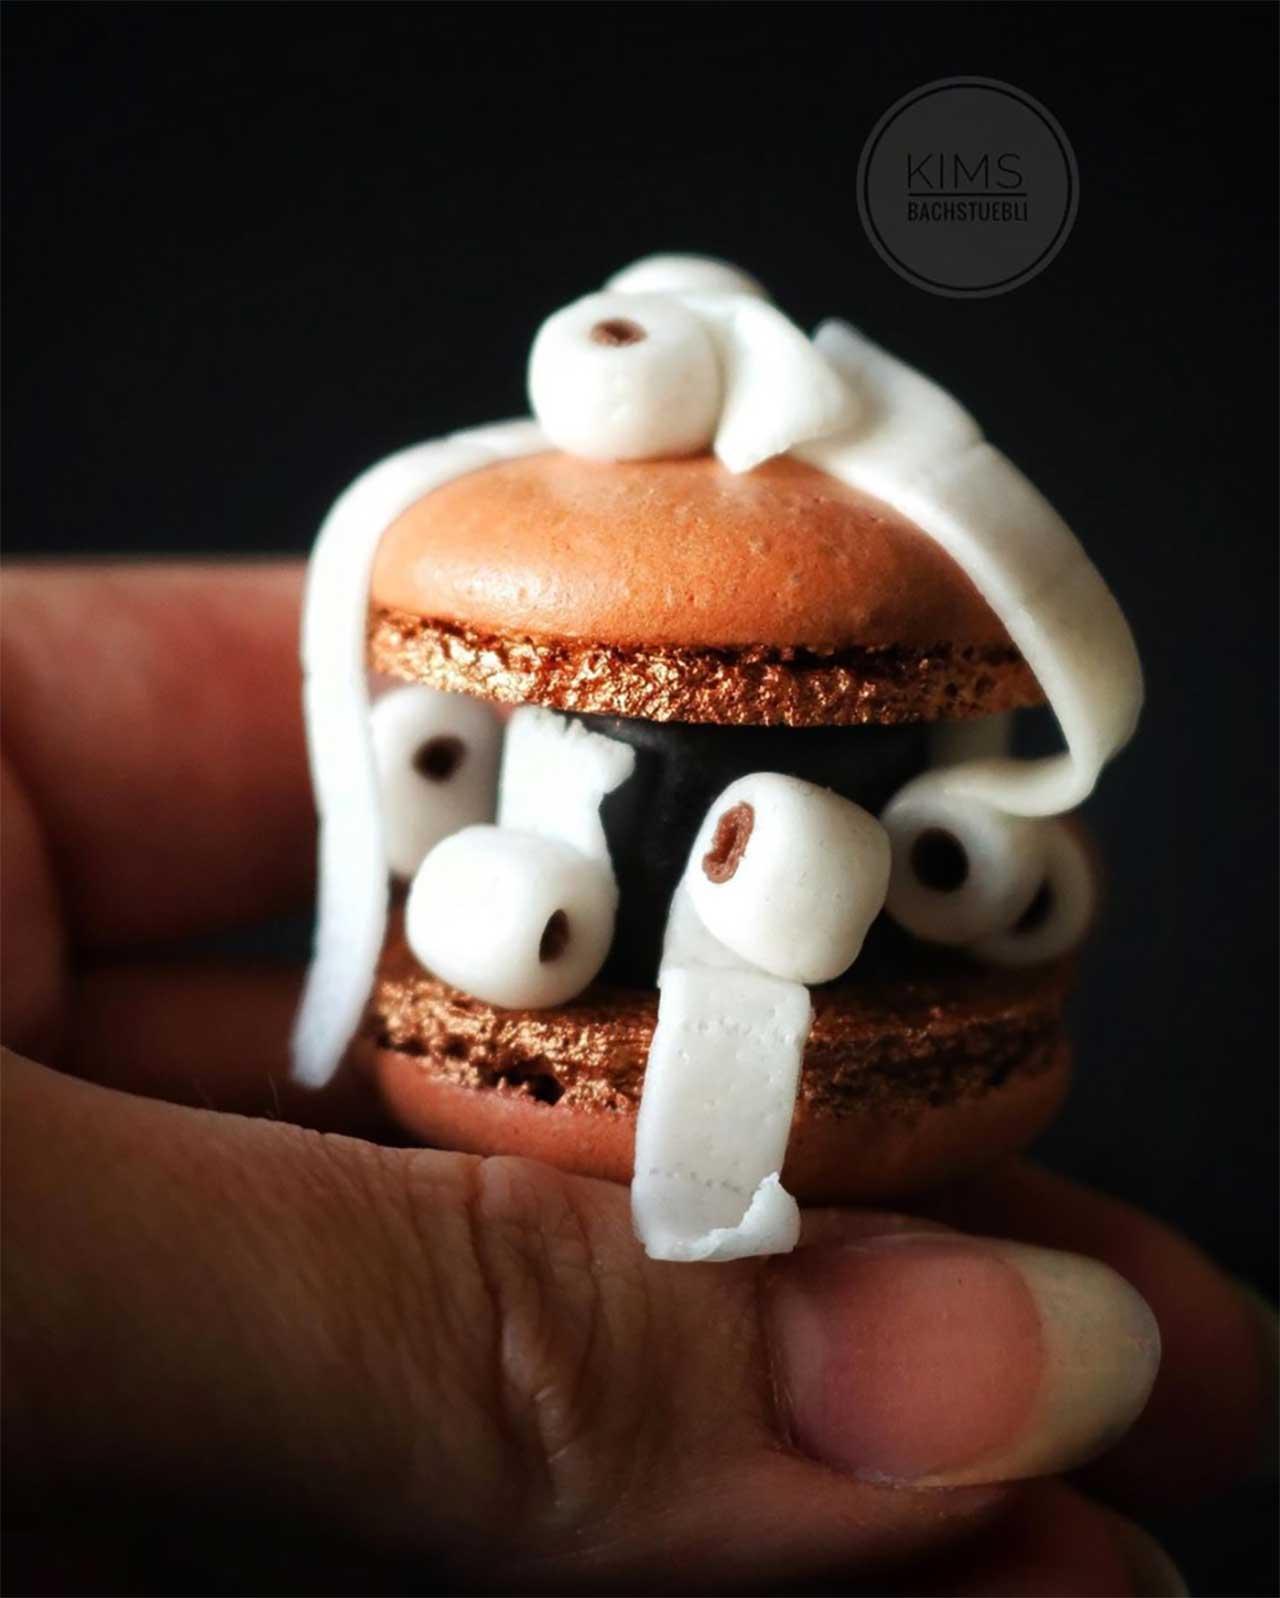 Ausgefallene Macarons aus kims_bachstuebli kim-delia-kims_bachstuebli_03